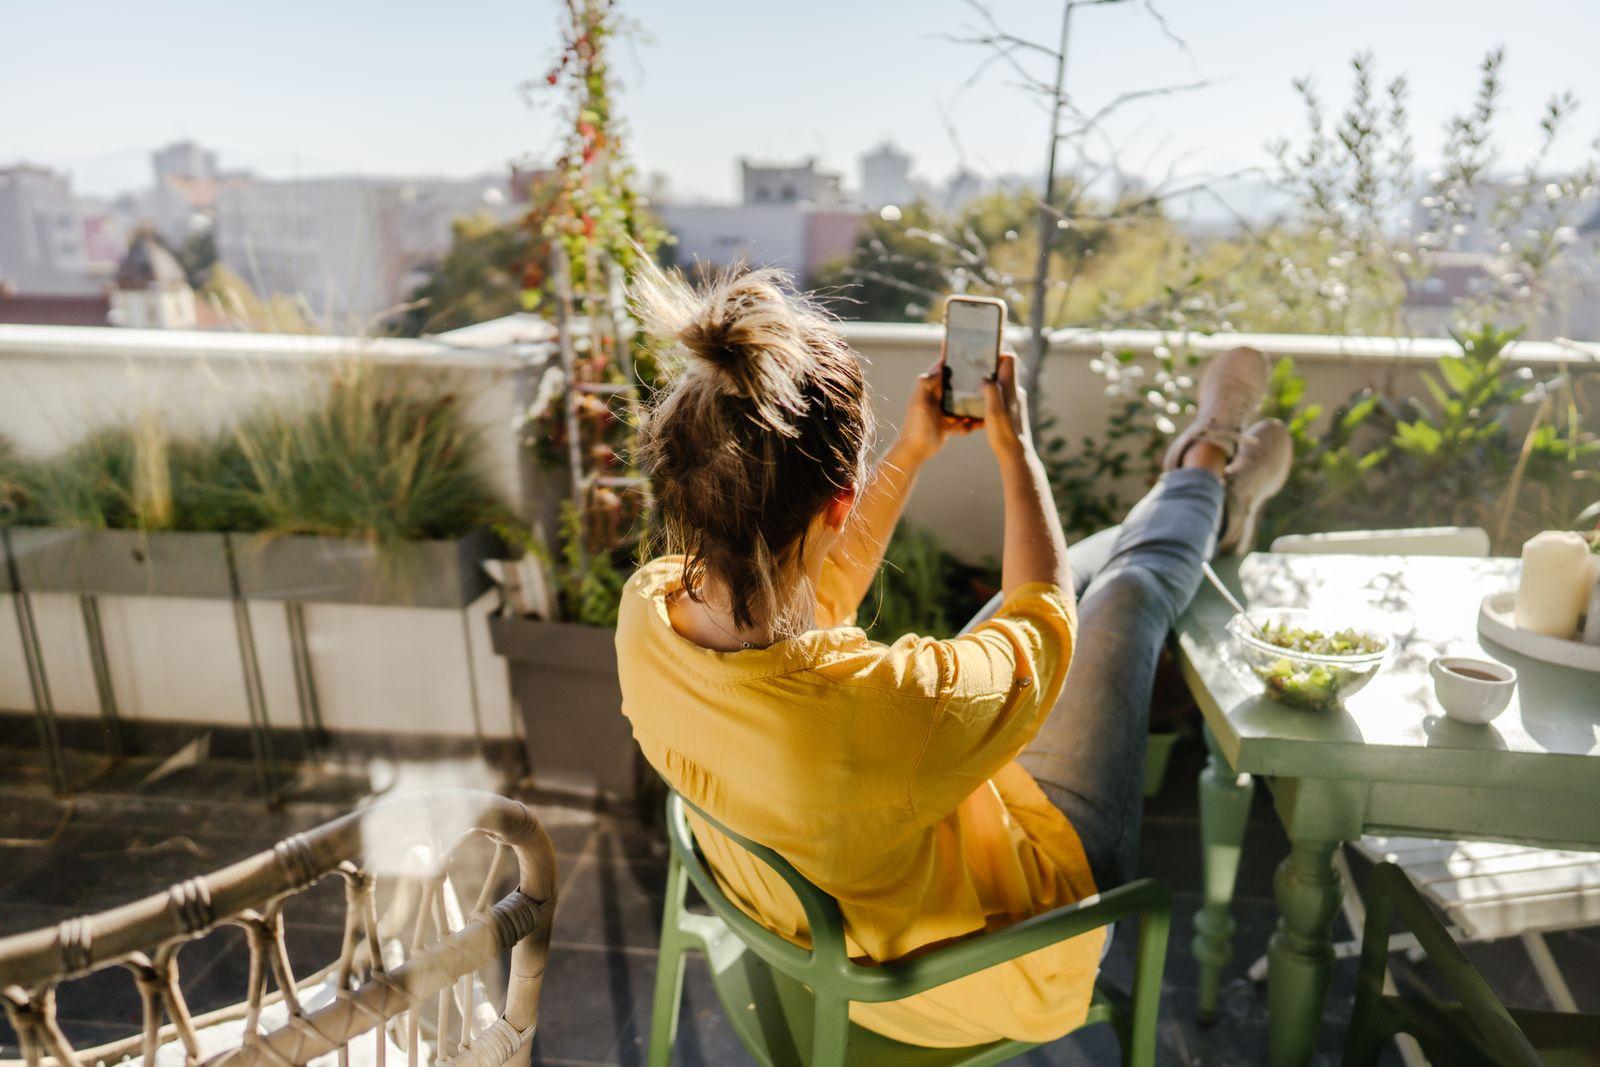 Enjoying spring on the balcony